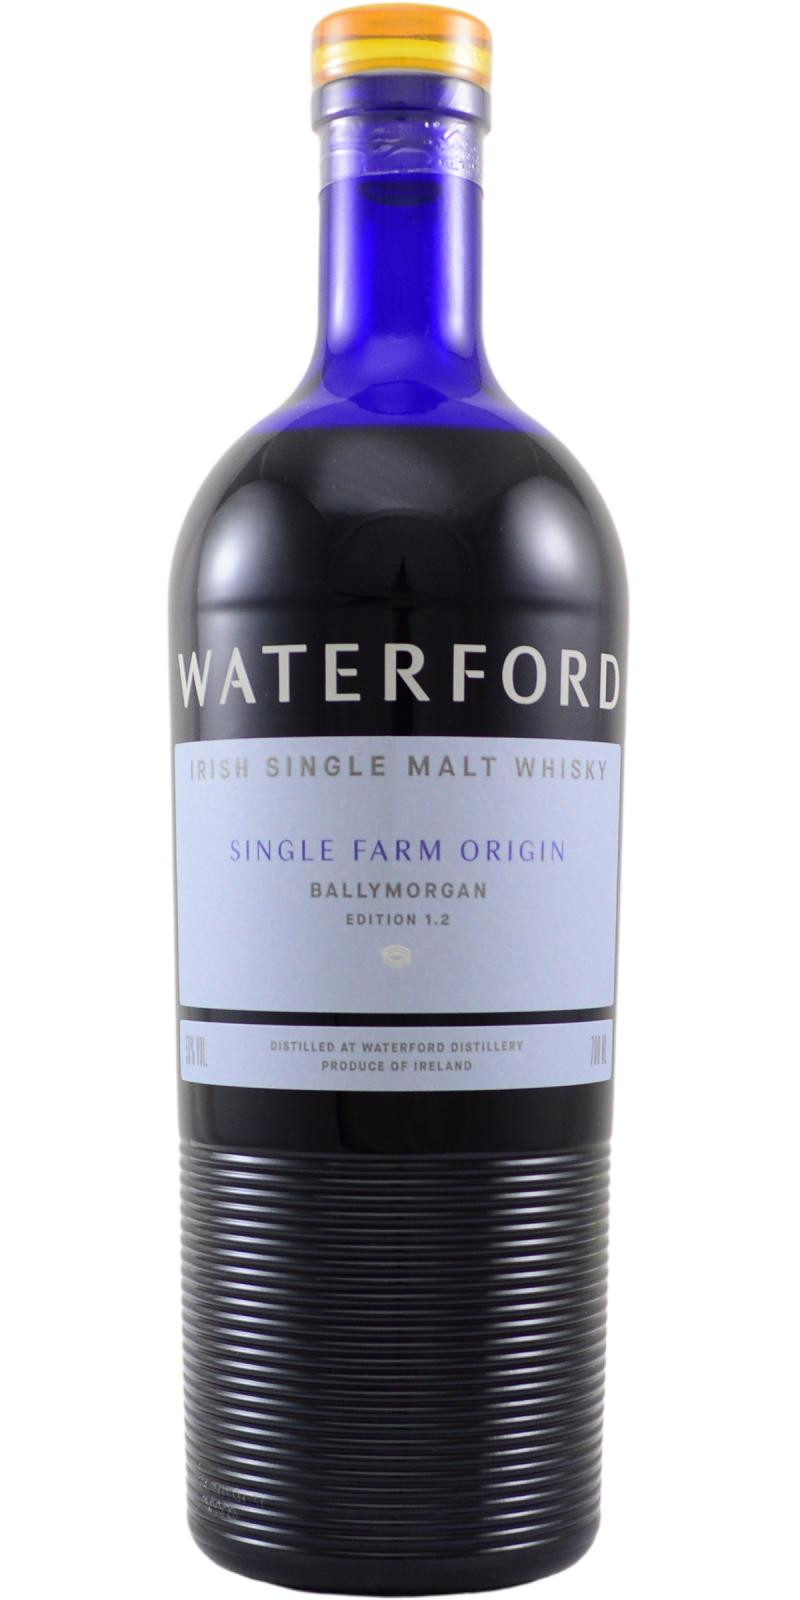 Waterford Ballymorgan: Edition 1.2